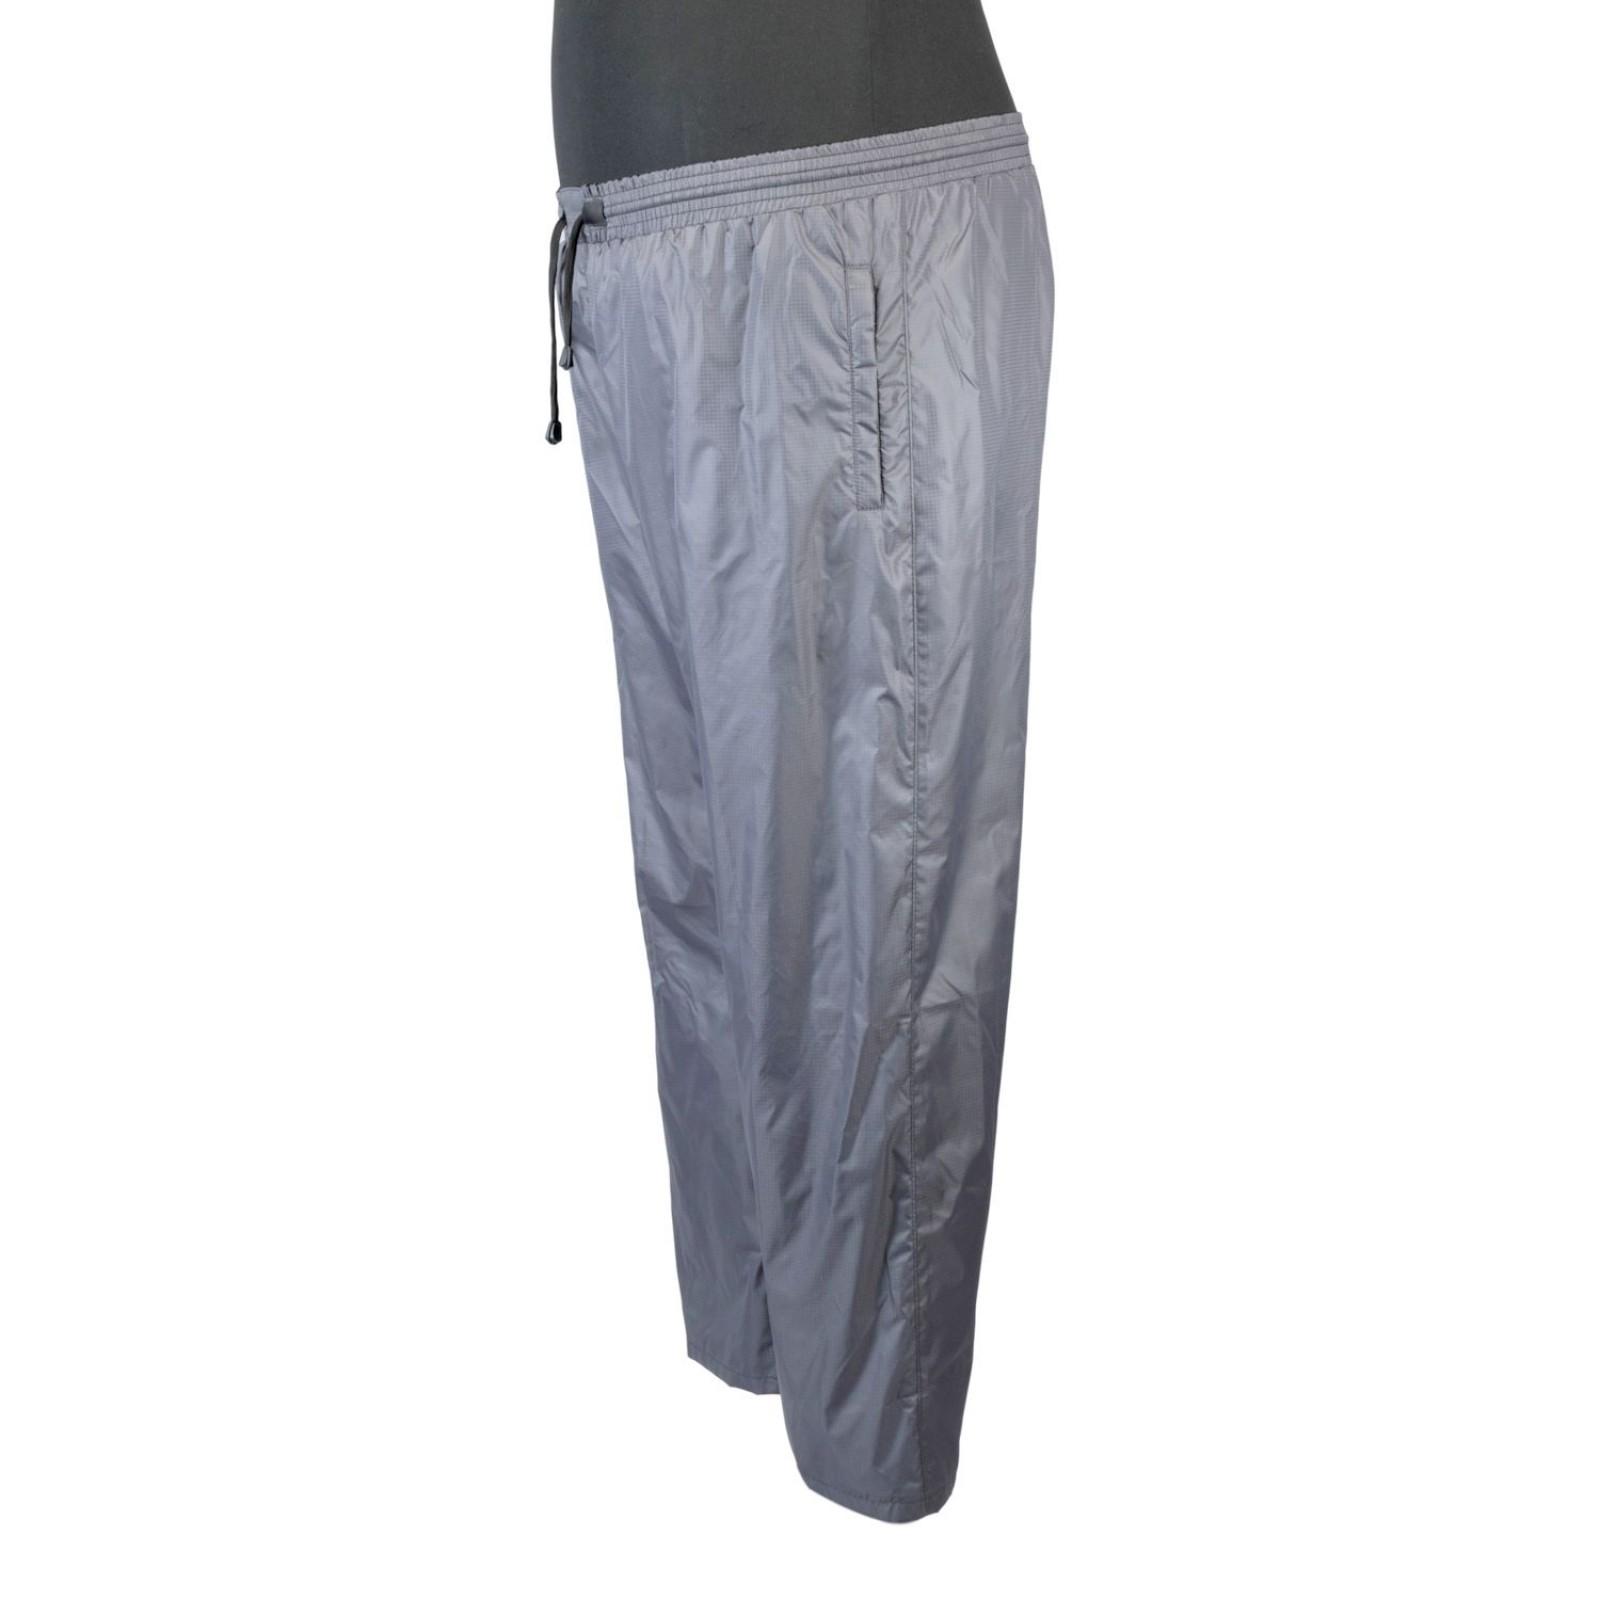 31708e11eddda Спортивные брюки серого цвета на подкладке из сетки большого размера;  5kv5IoQf9LZsIPUq; bp1W2aZCk57B7hFb